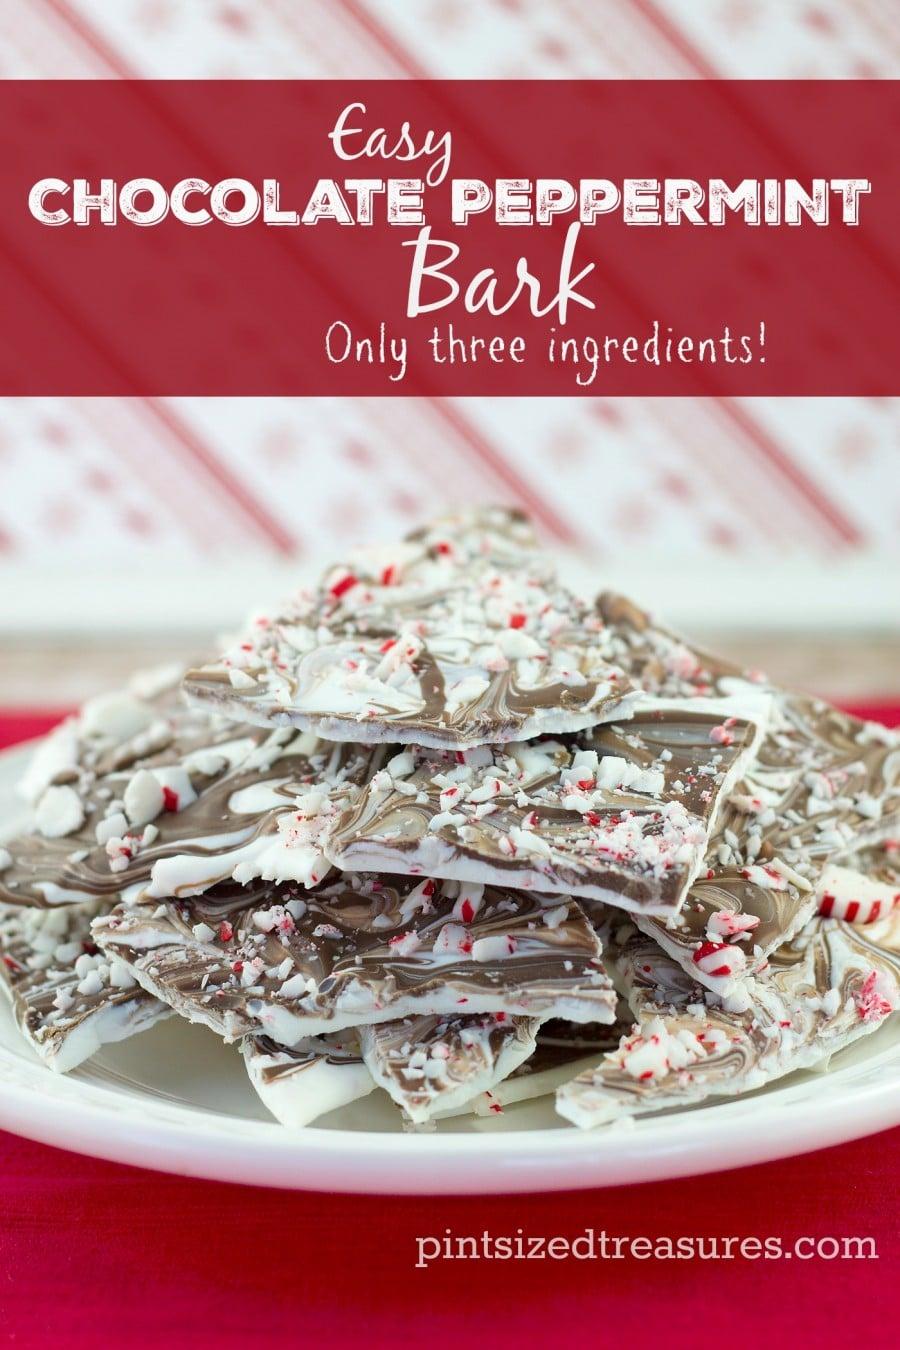 Chocolate Peppermint Bark » Pint-sized Treasures